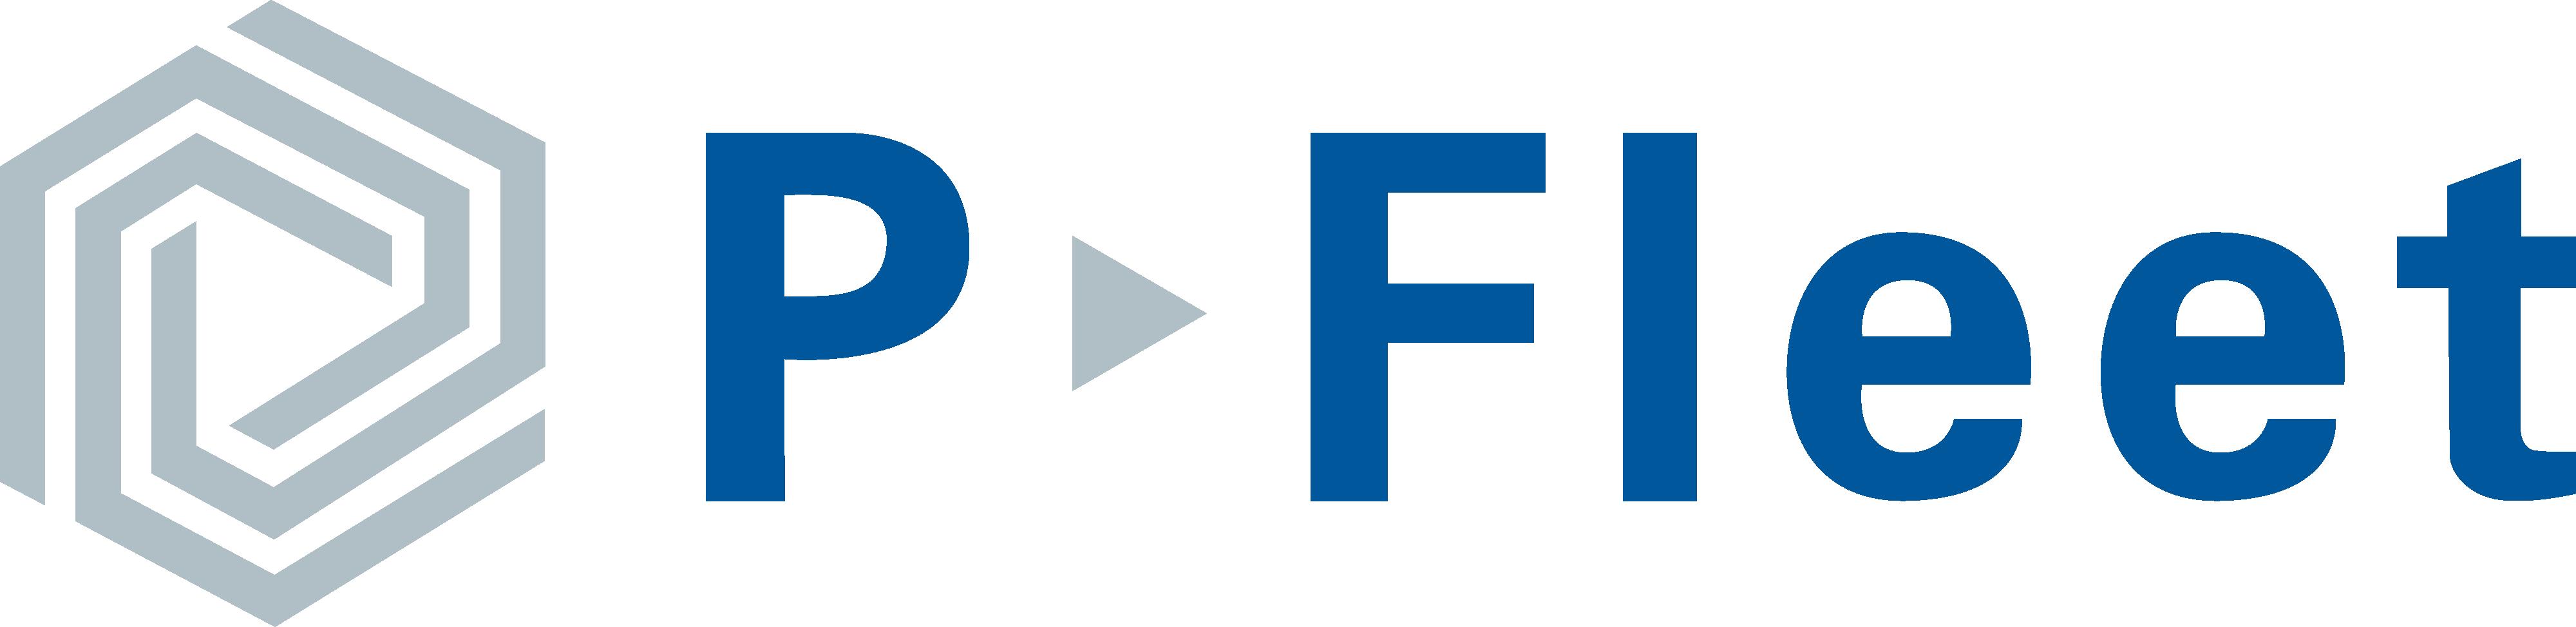 P-Fleet Logo Blue Grey w extra vertical white space